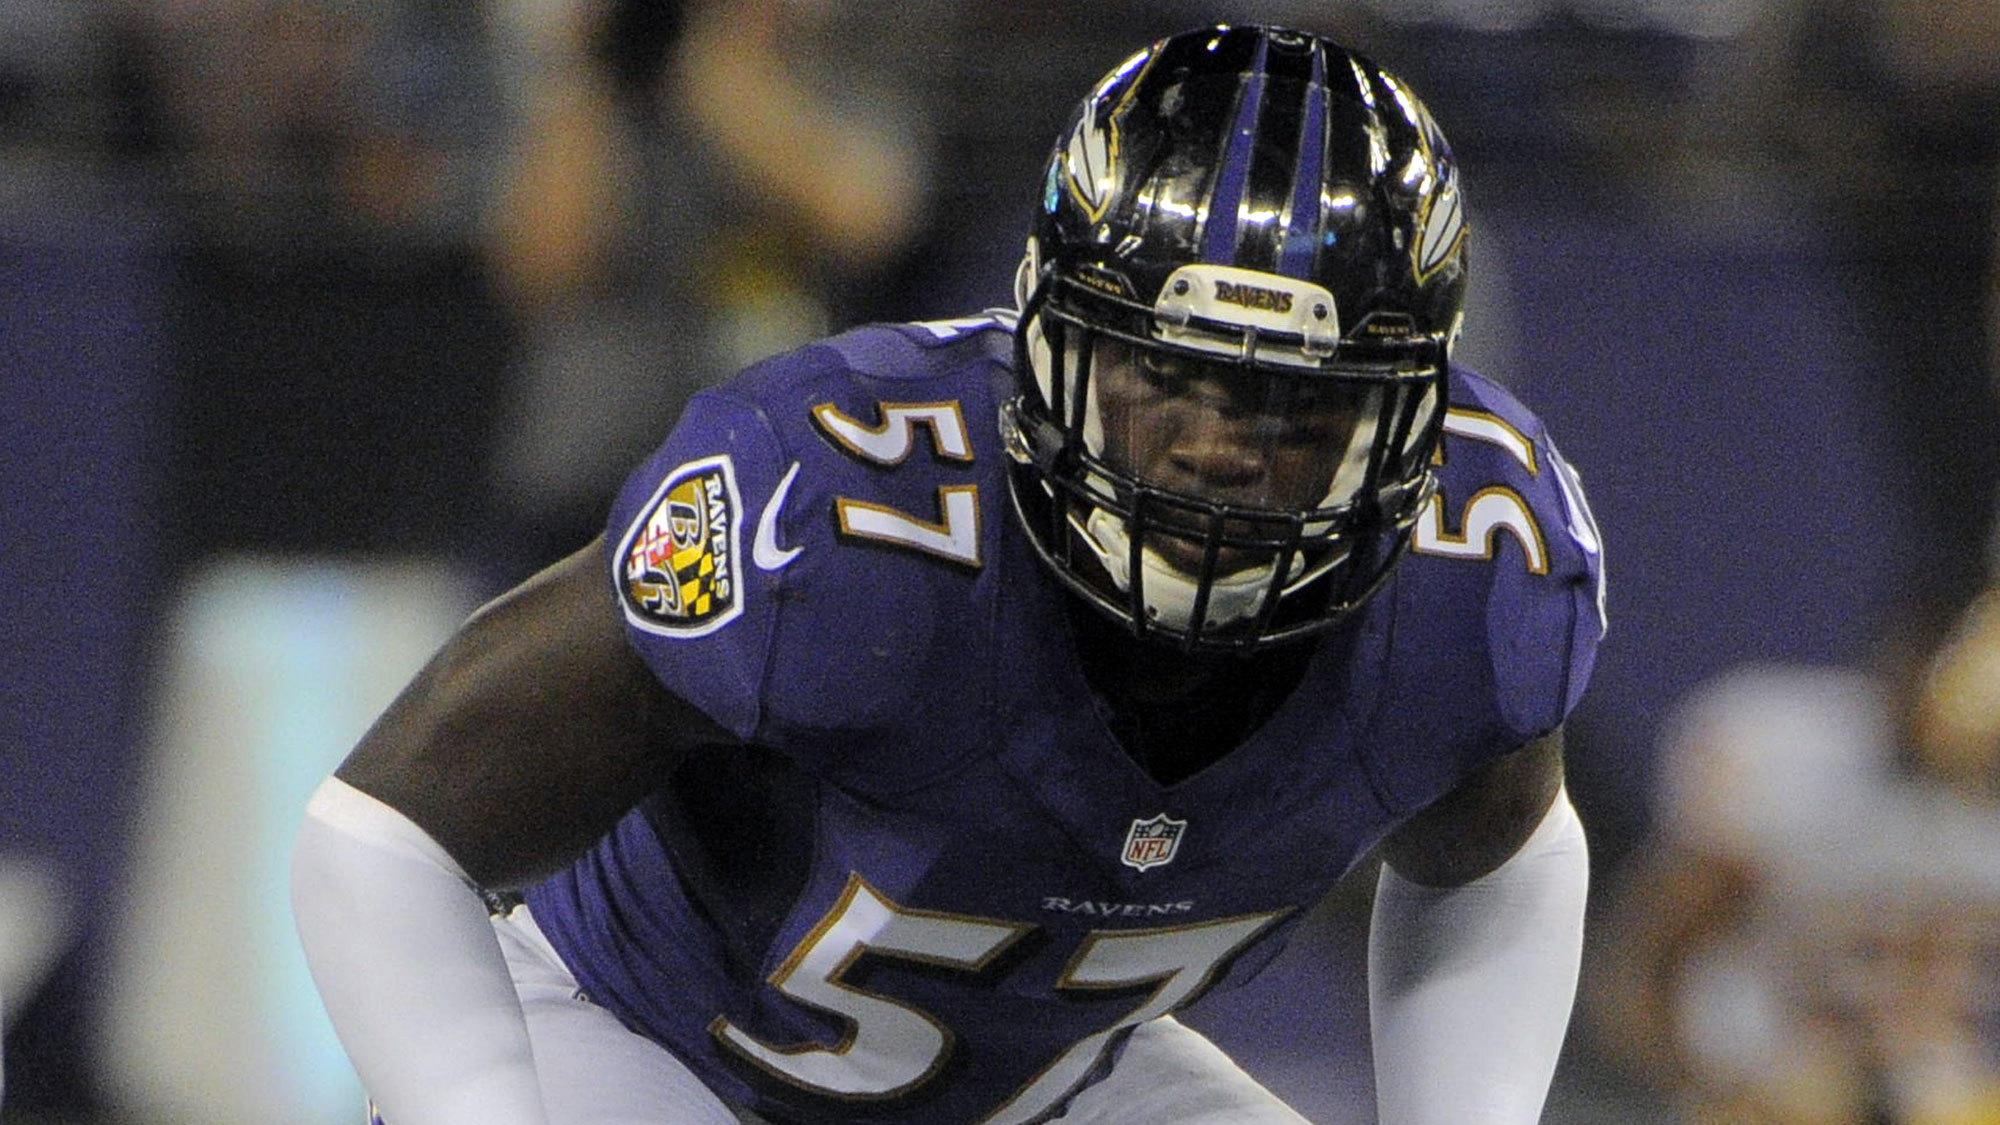 Ravens rookie linebacker C J Mosley bracing for potential fine